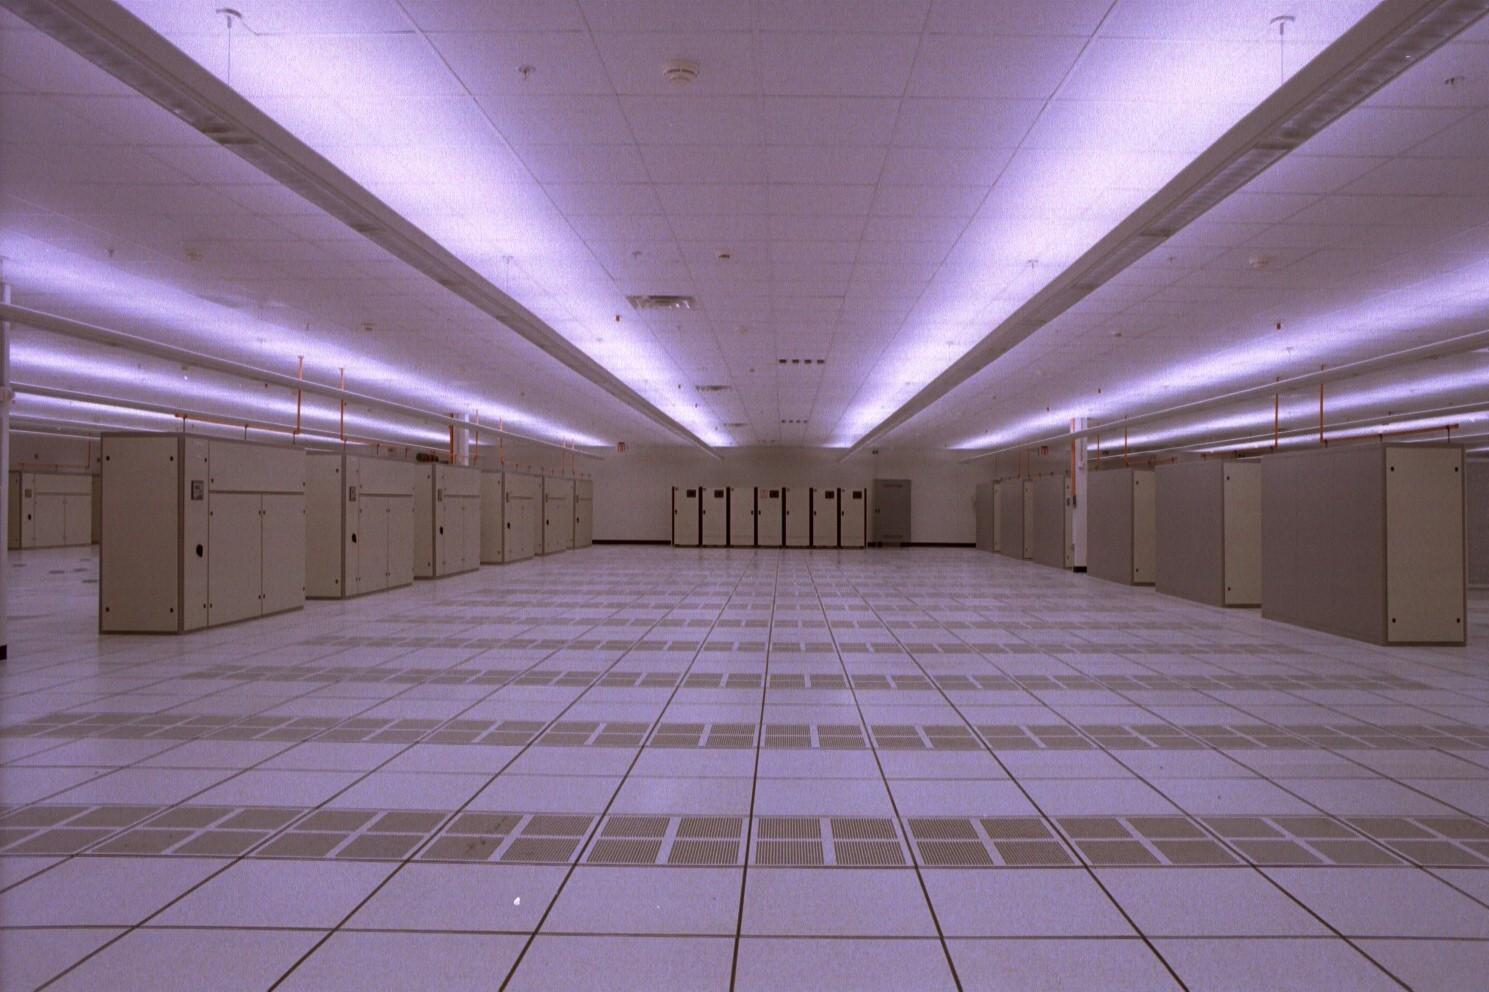 https://www.ebapc.com/wp-content/uploads/2016/04/Data-Center-PSINet-computer-room.jpg